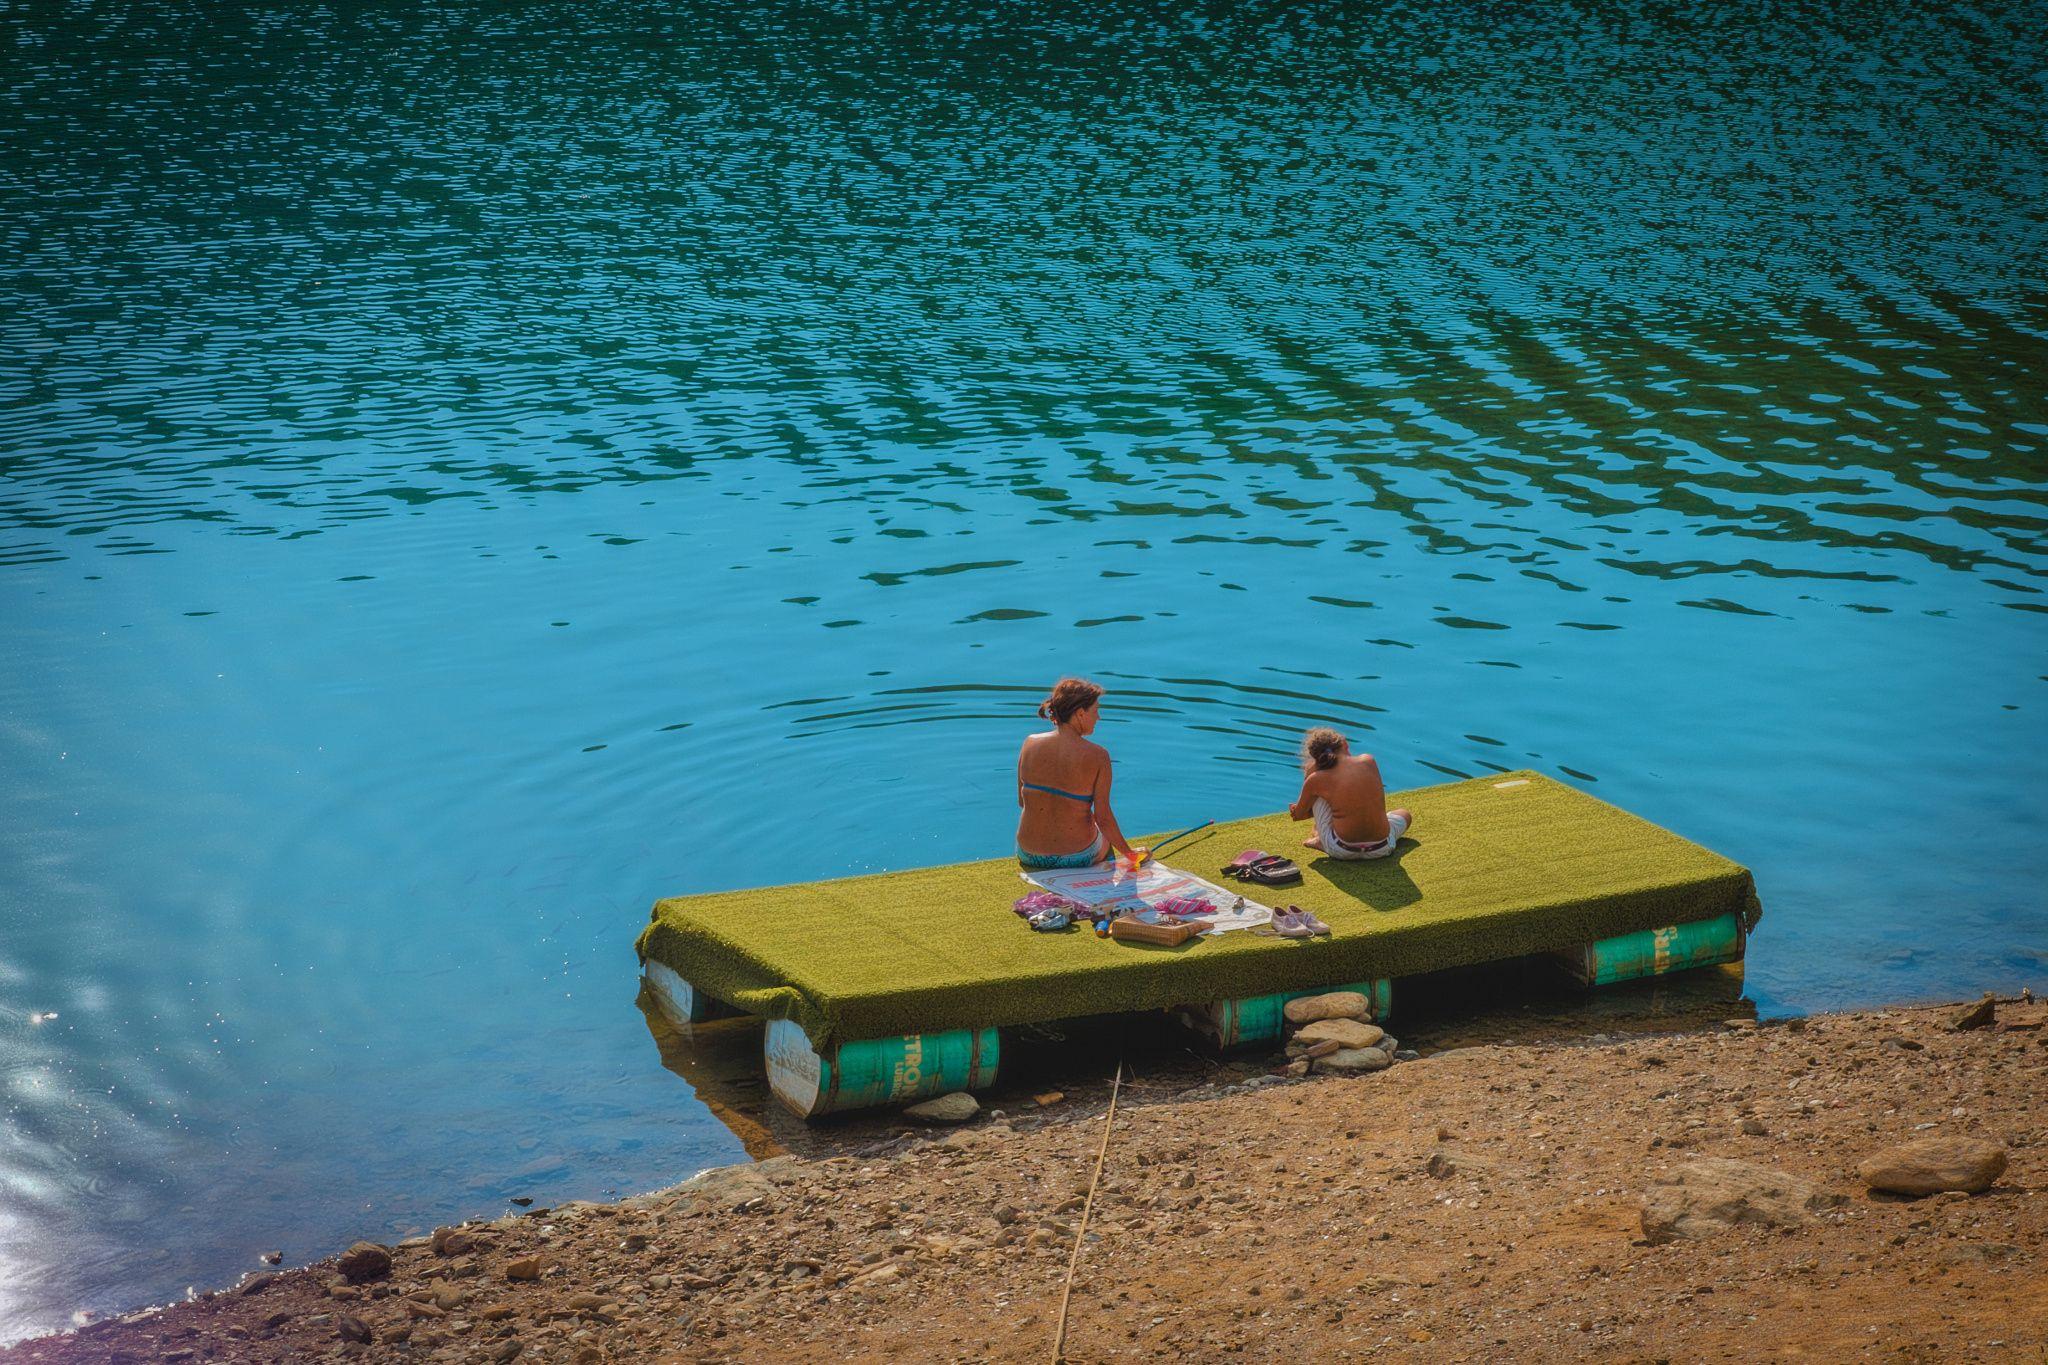 Last days of Summer - Lago di Osiglia (Val Bormida, Italy)